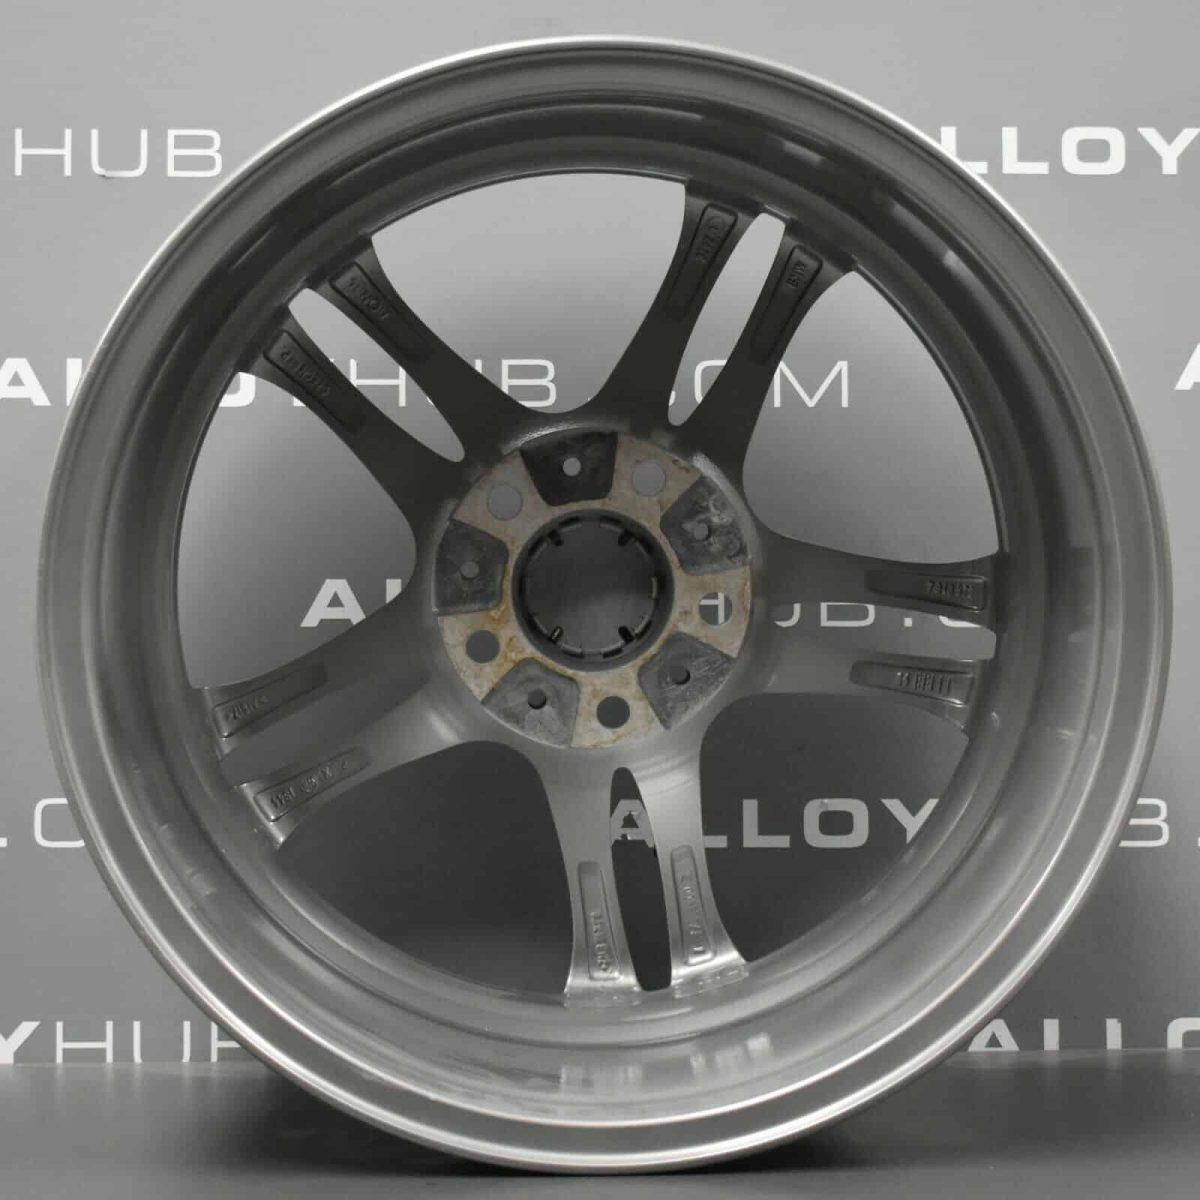 "Genuine BMW 5 Series F10 F11 613M Sport 5 Twin Spoke 18"" inch Alloy Wheels with Ferric Grey Finish 36117848572 36117848573"